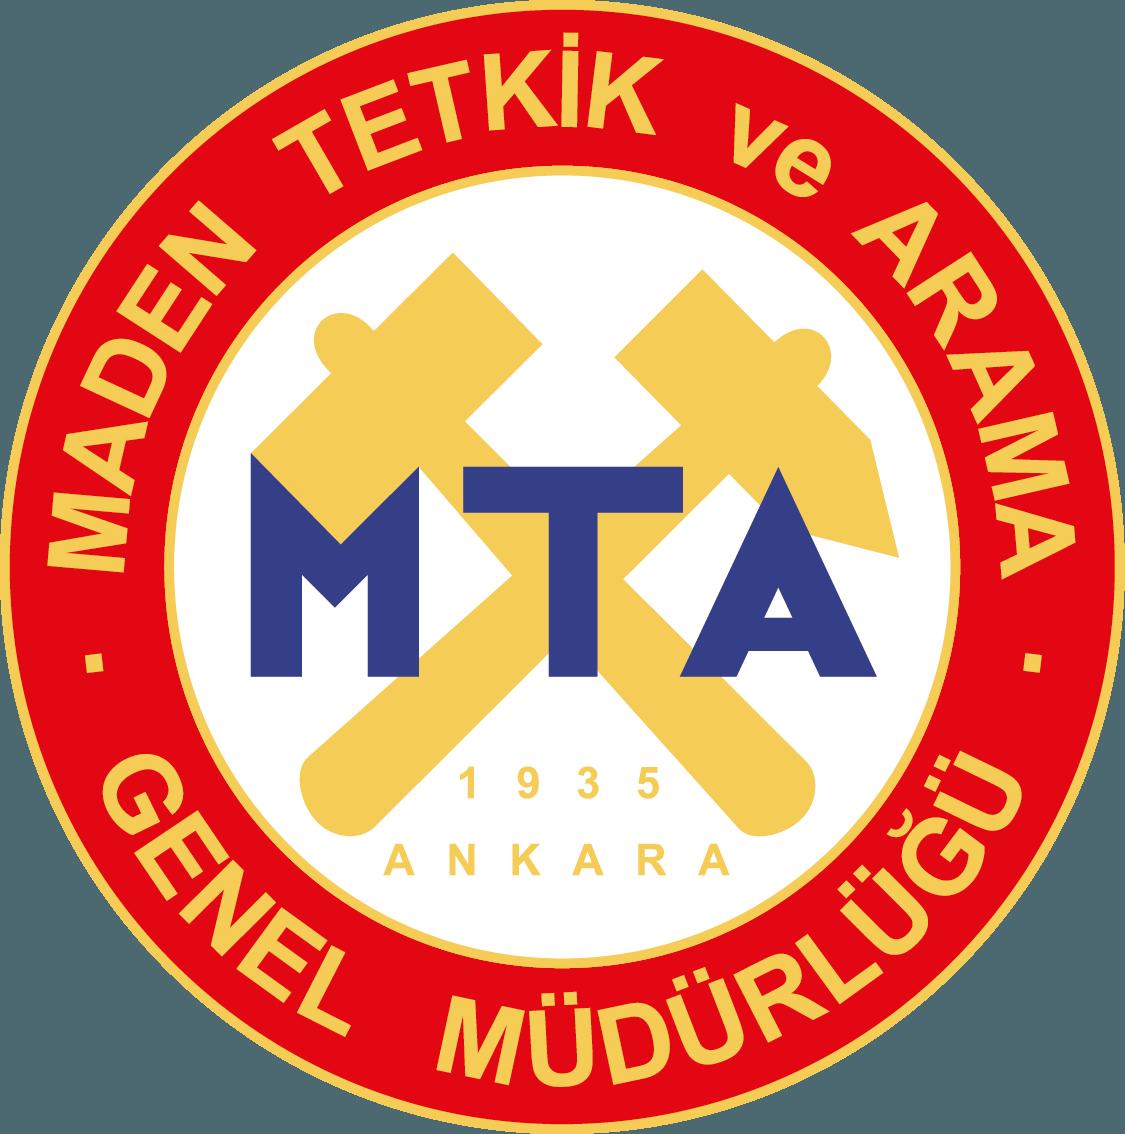 MTA   Maden Tetkik Arama Genel Müdürlüğü Logosu [mta.gov.tr] png